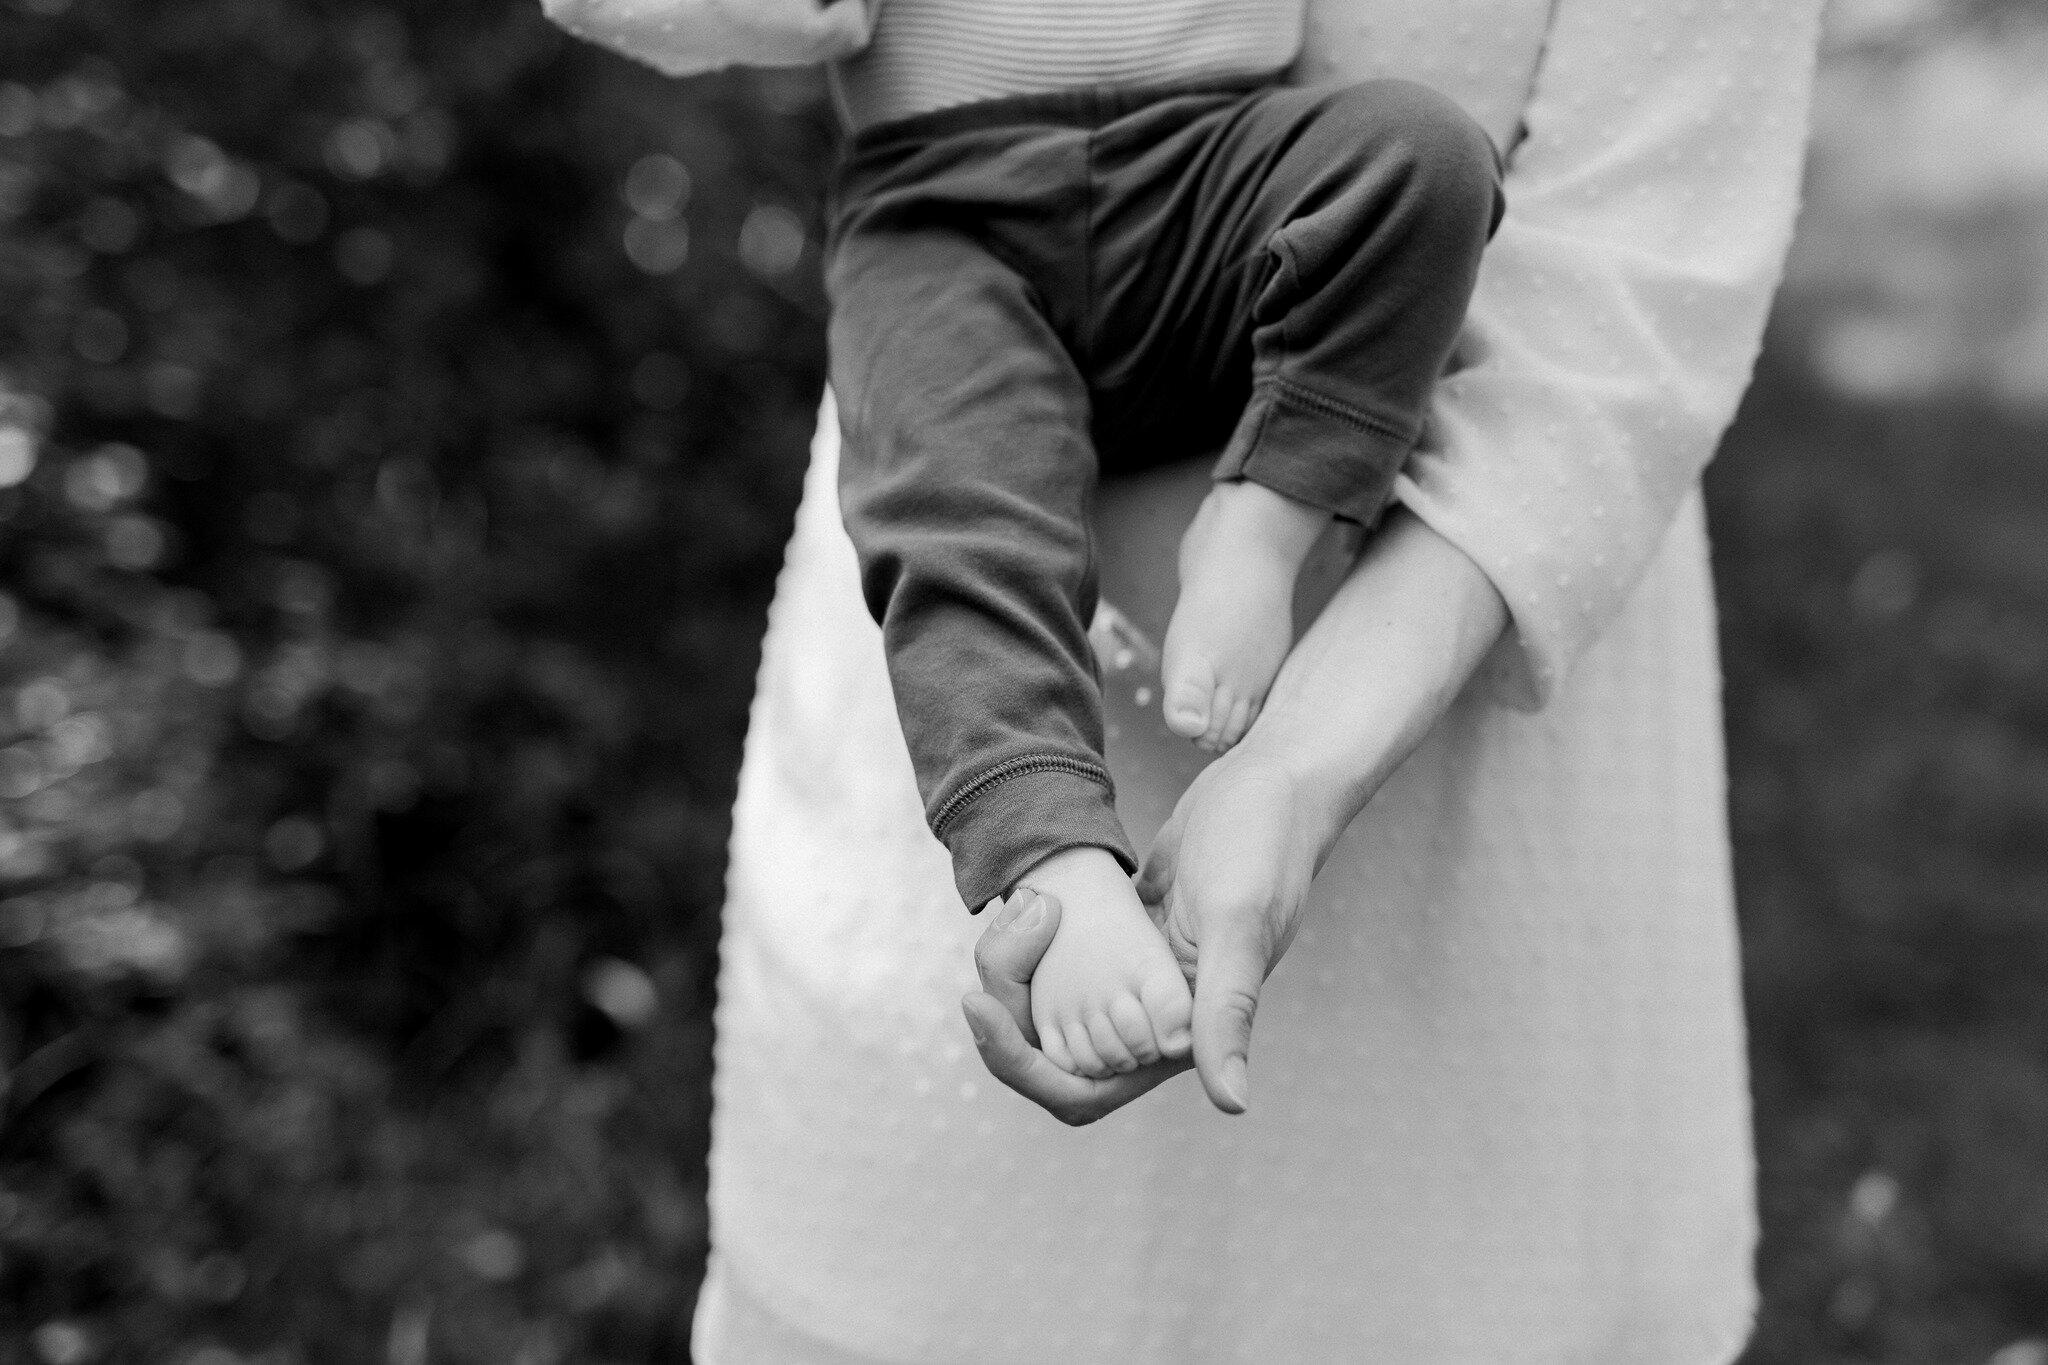 ct motherhood session_motherhood story CT_motherhood photographcer CT_6.jpg